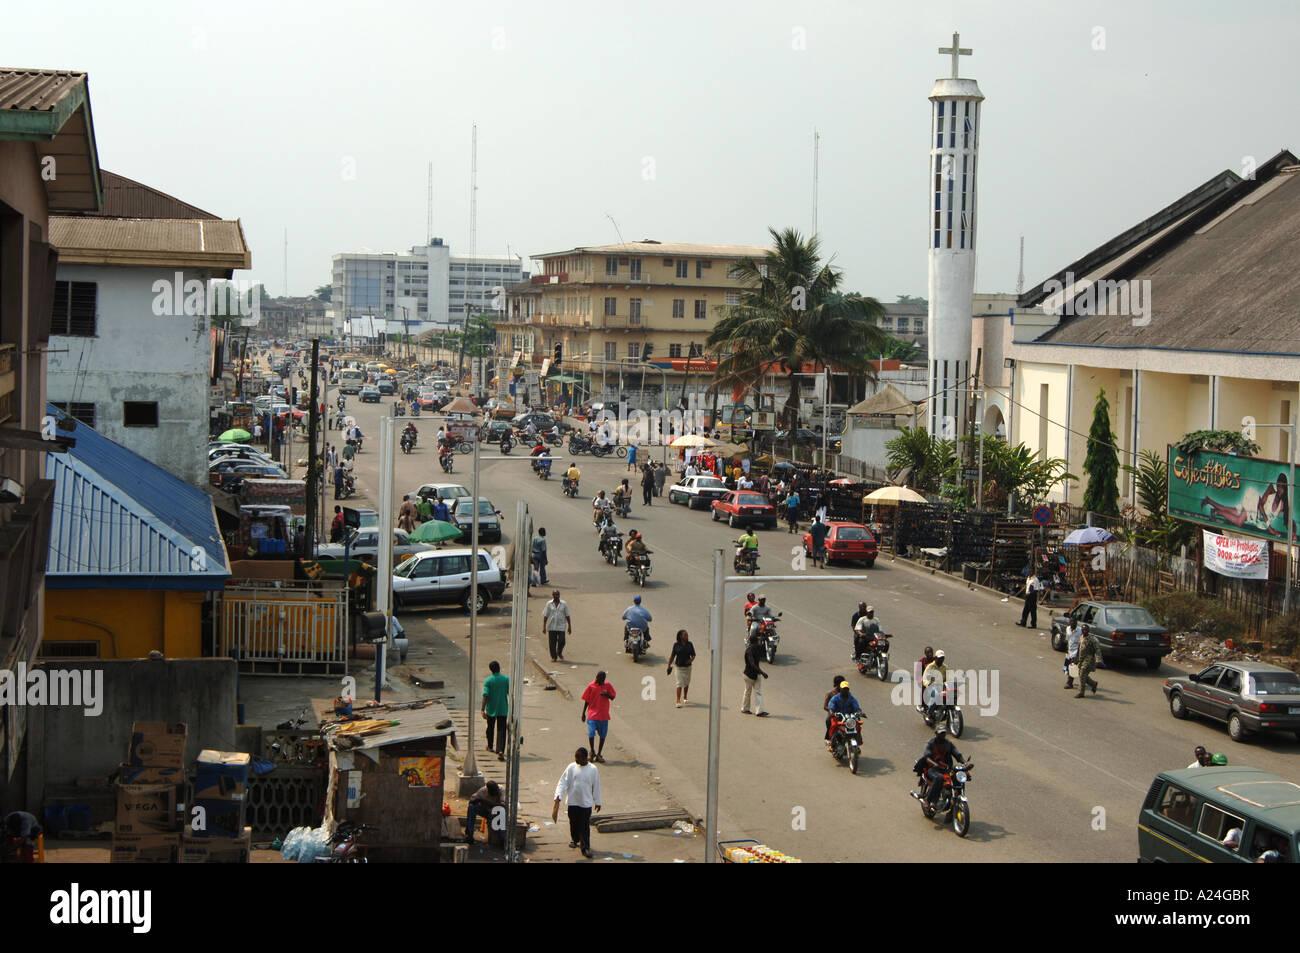 A busy traffic scene